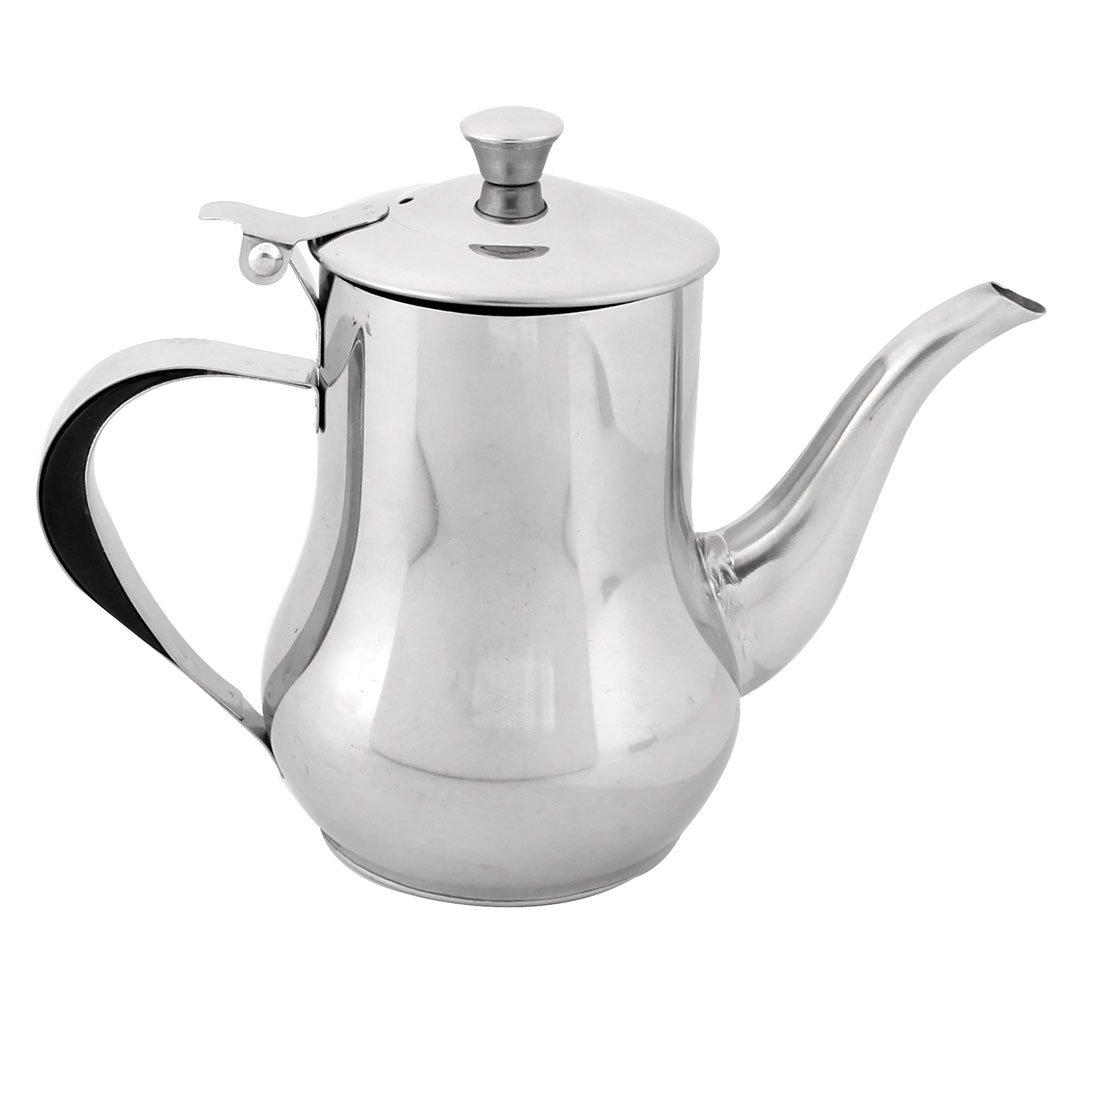 uxcell Stainless Steel Cooking Oil Vinegar Soy Sauce Can Dispenser Kettle Pot Bottle